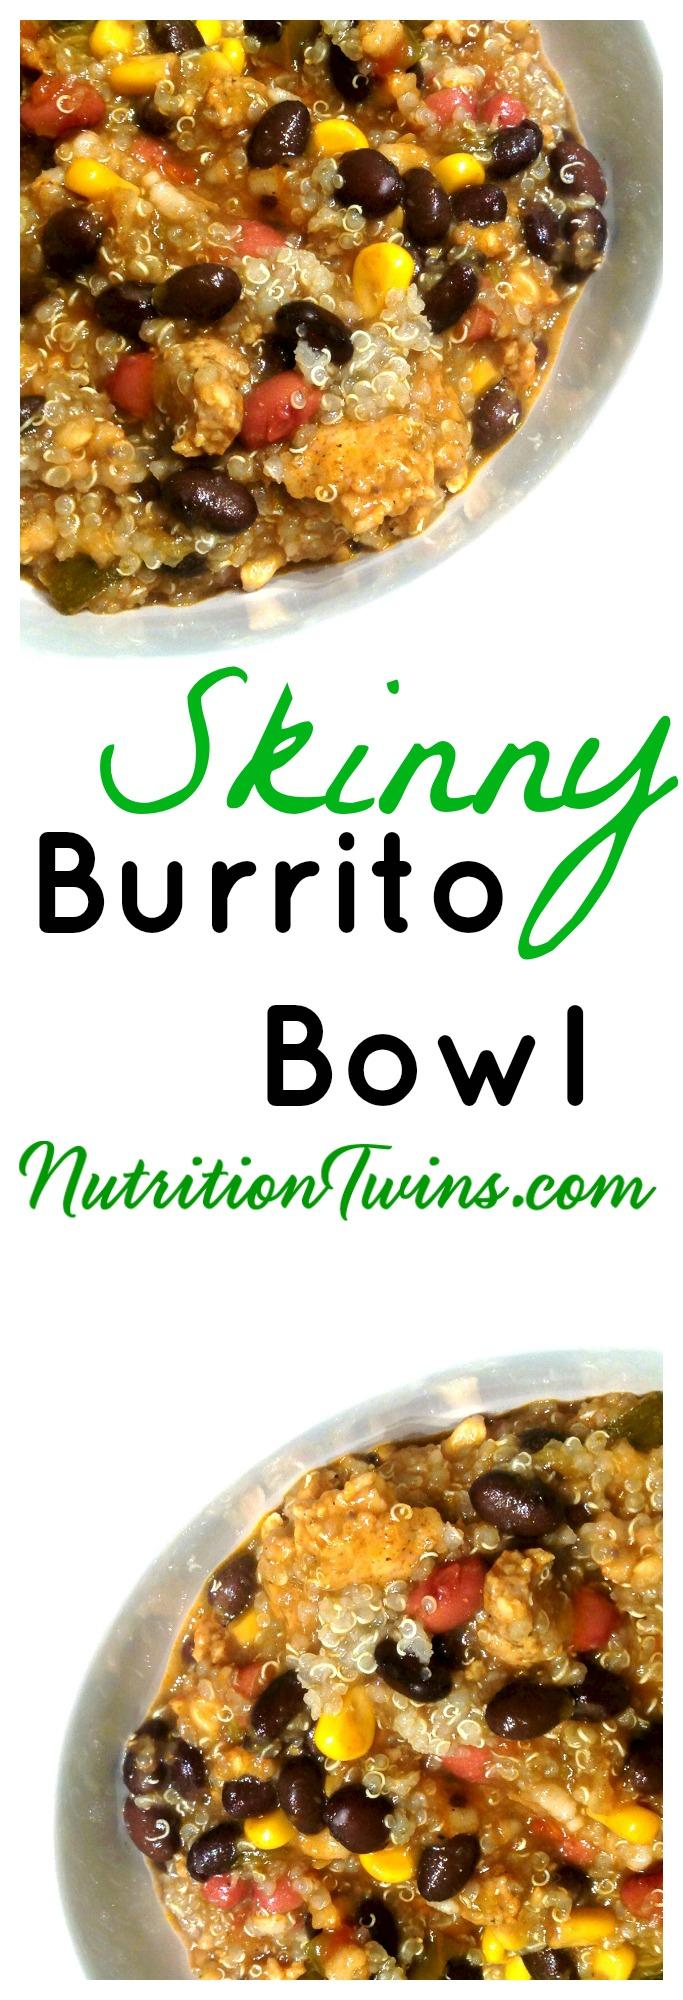 Skinny Burrito bowl pinterst